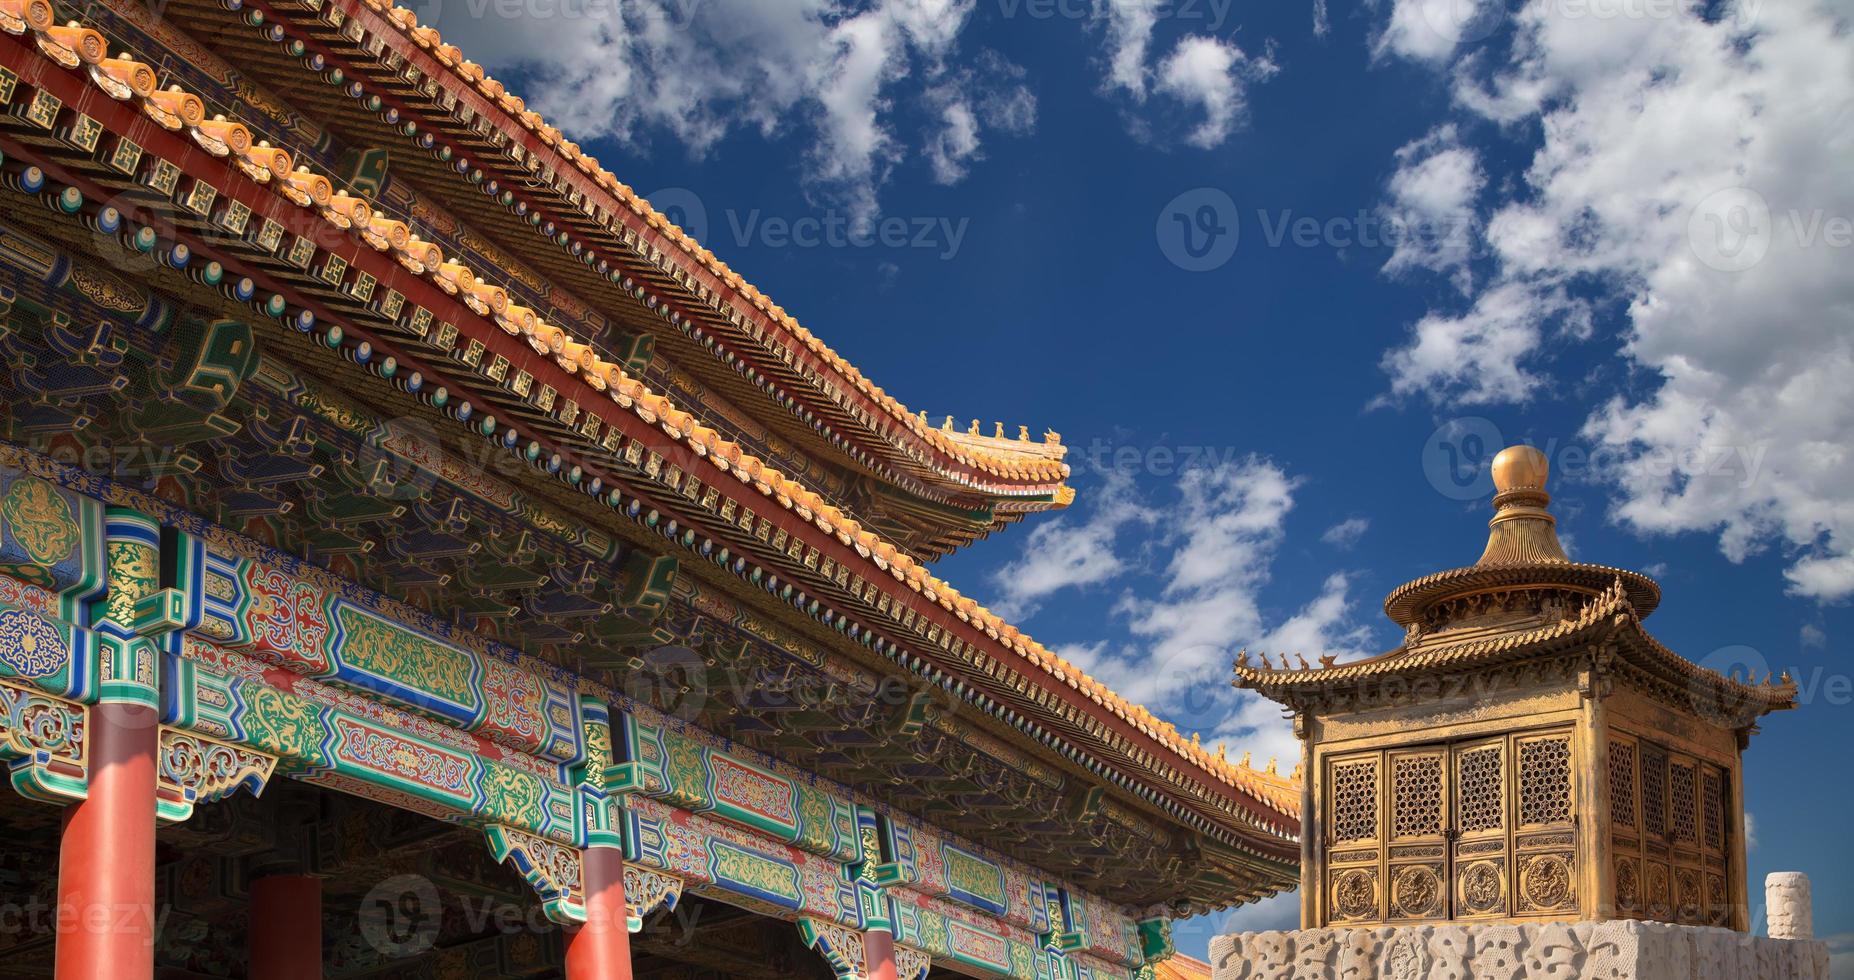 ciudad prohibida, beijing, china foto